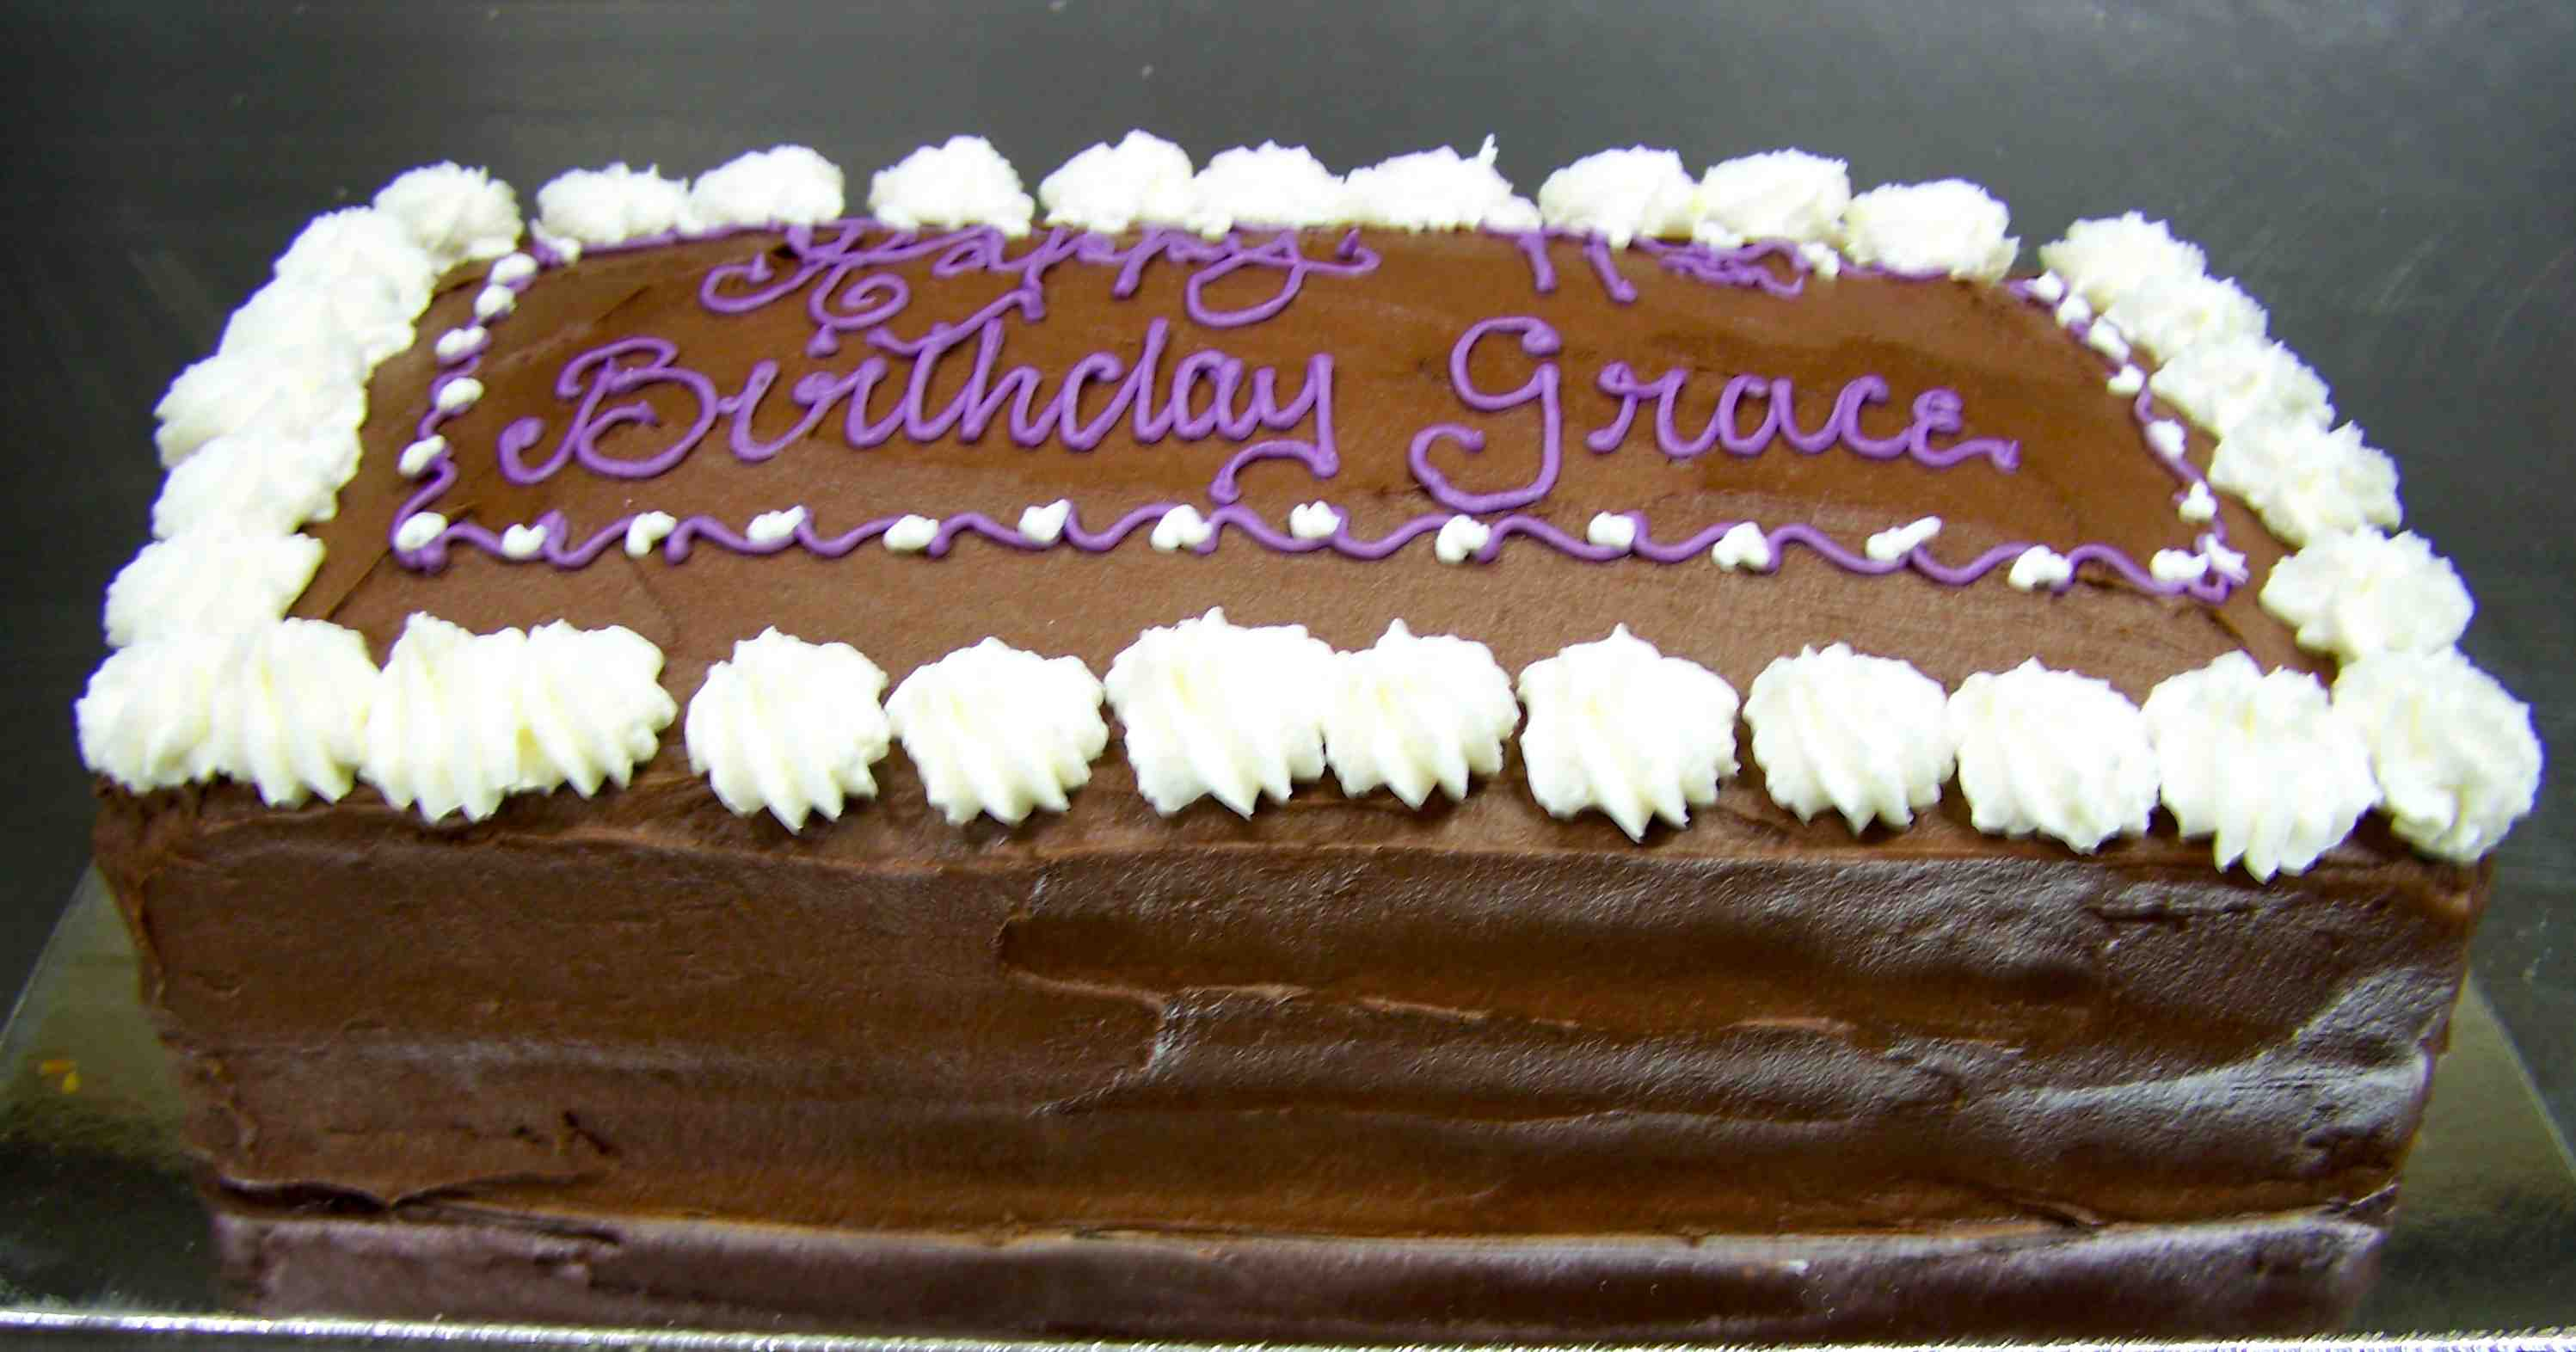 Richies bakery tewantin cooroy special occasion cakes 9 birthday chocolate slab mudcake feeds 40 publicscrutiny Choice Image